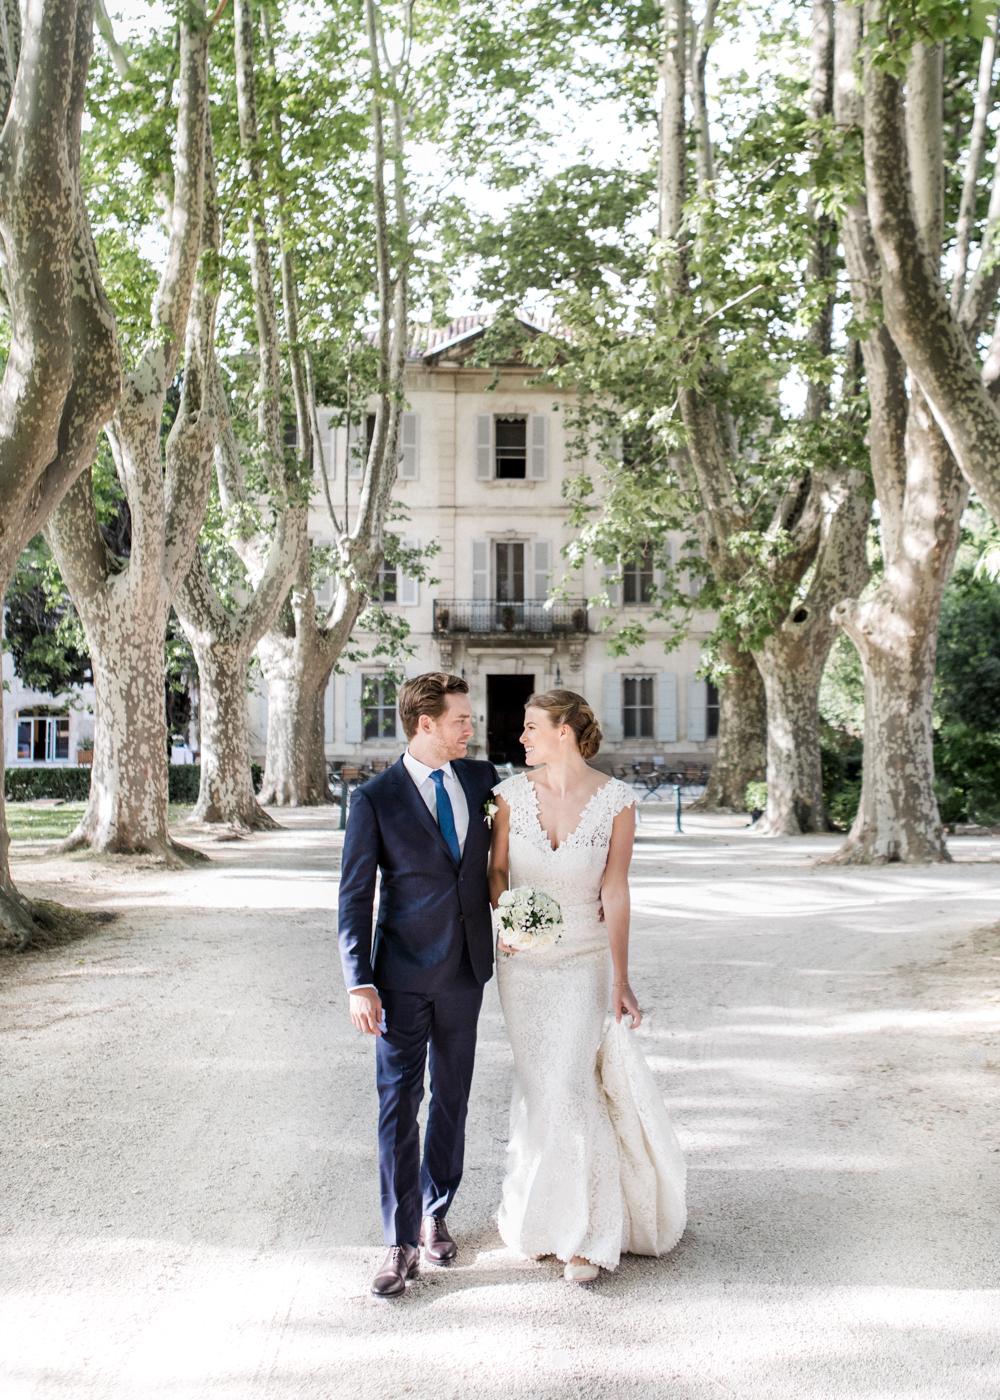 Provence_Wedding_(c)_Rory_Wylie-100.jpg